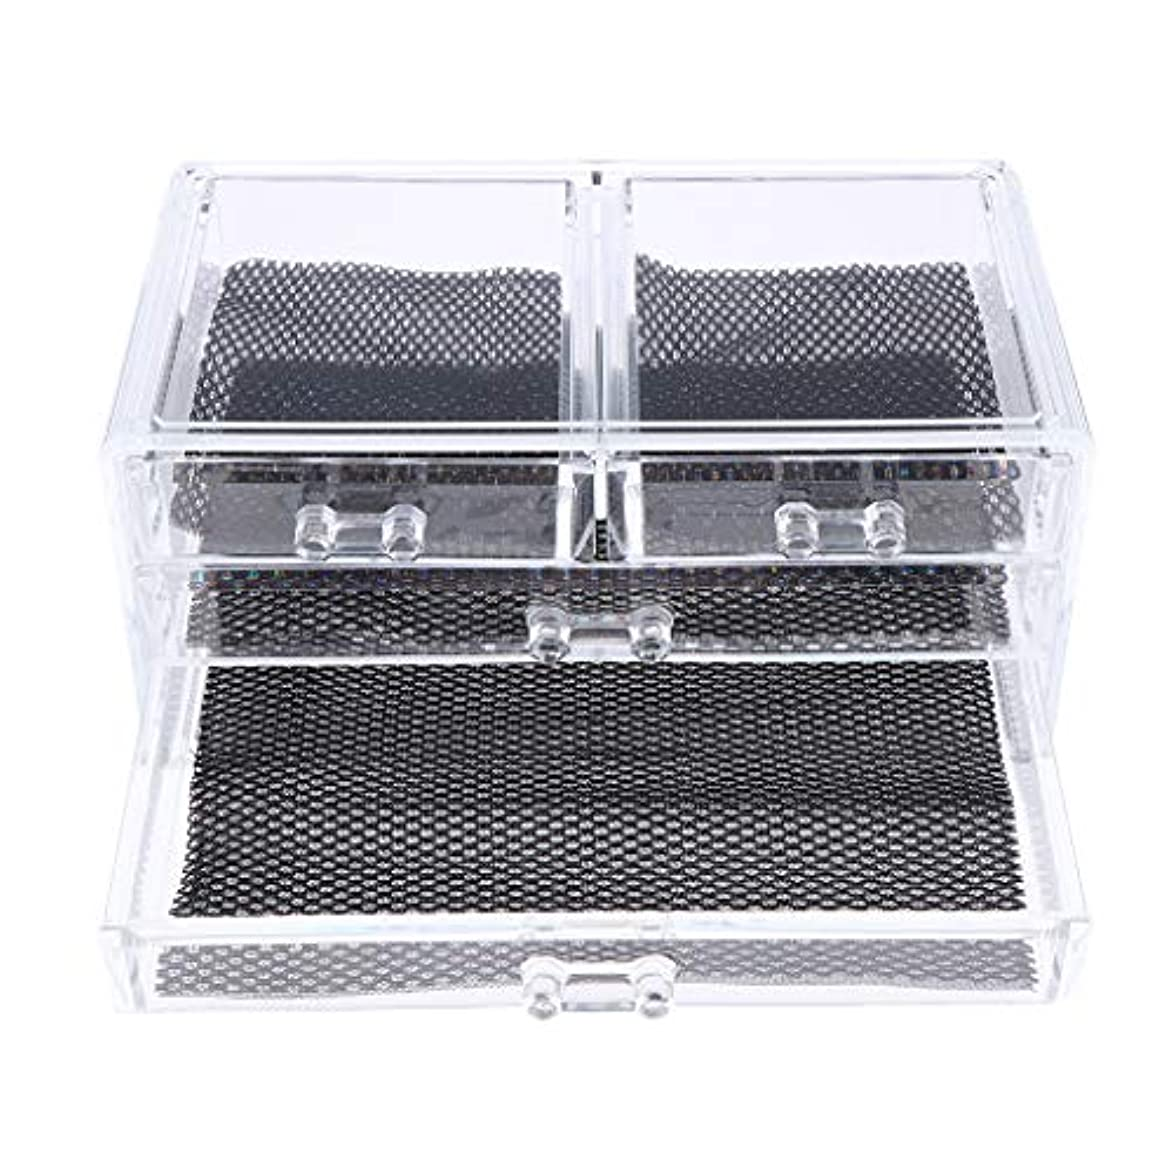 Perfeclan 化粧品収納ボックス メイクケース 化粧品収納整理 防塵 透明 コスメ収納ボックス 引き出し式 全3種 - 4つの引き出し